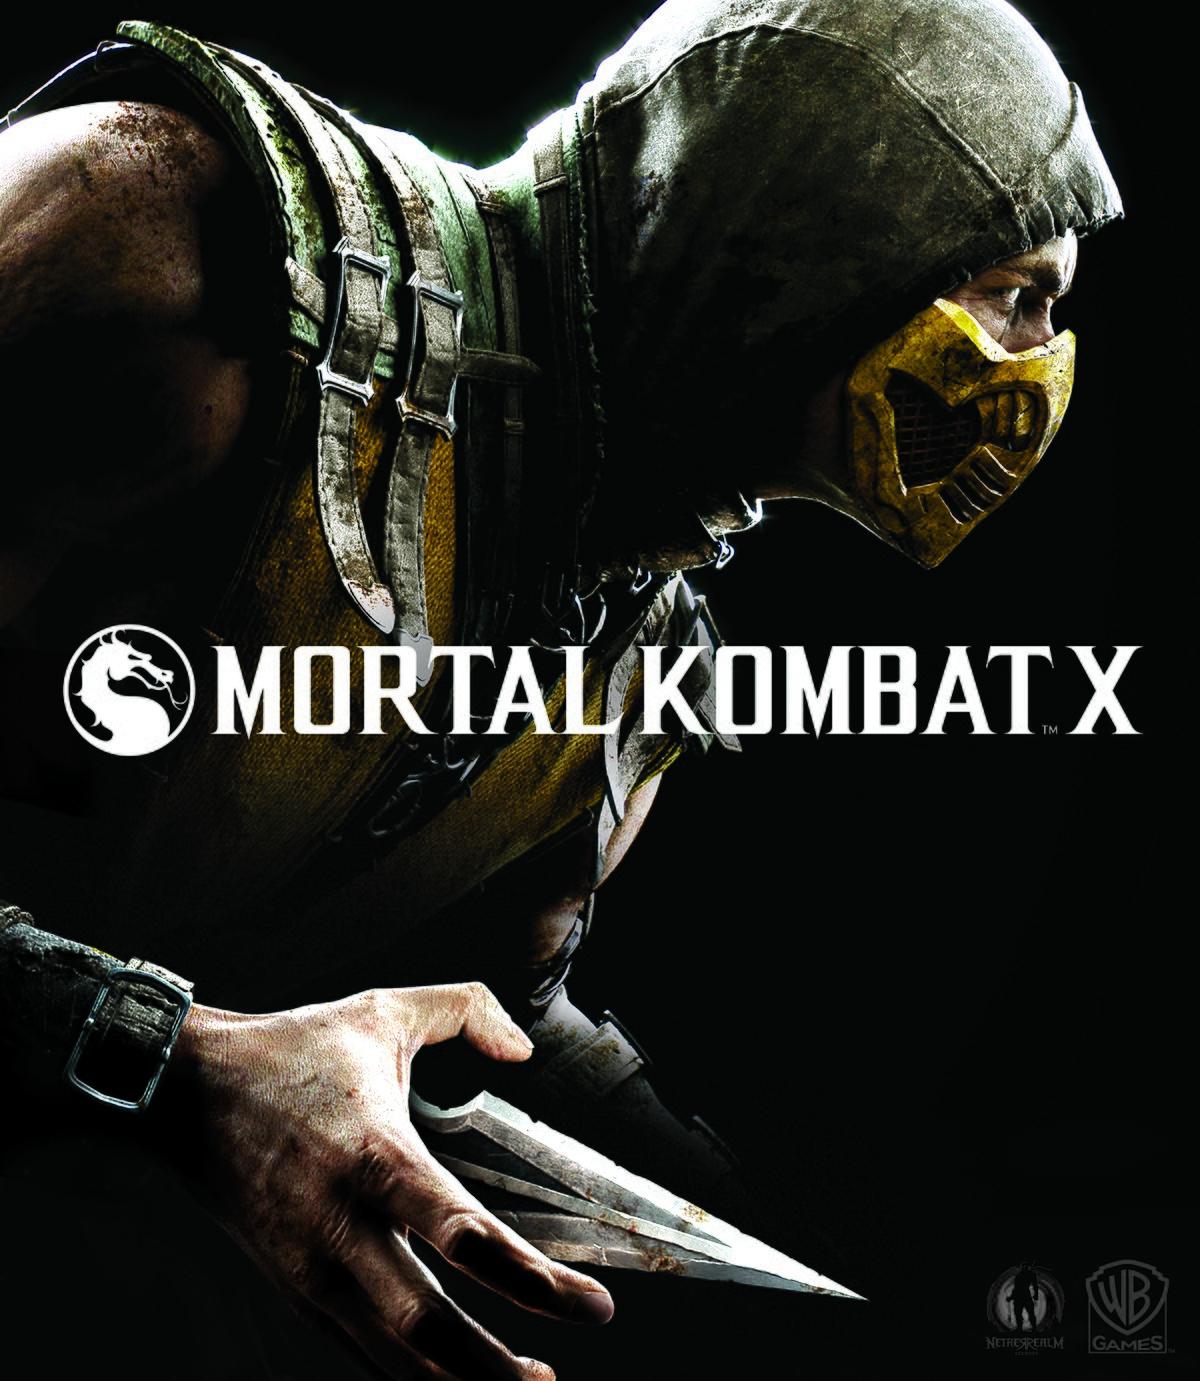 mortal kombat x (steam/global) + podarok 413 rur